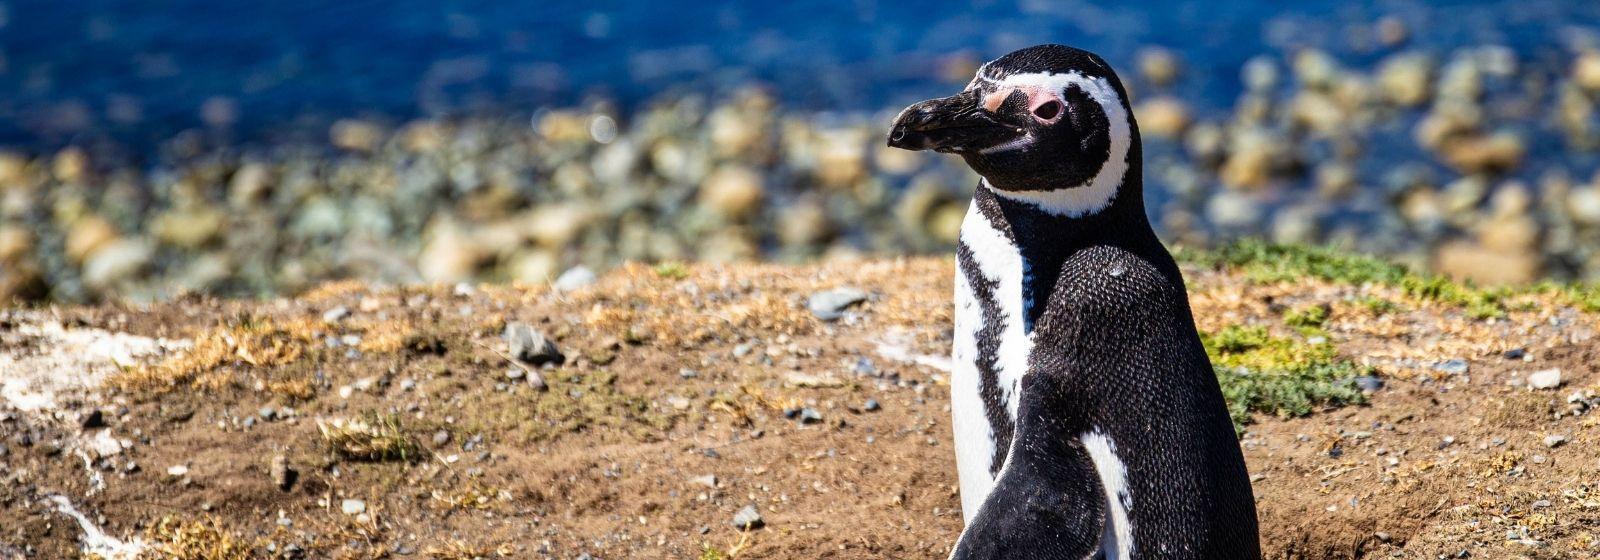 Things to do in Punta Arenas